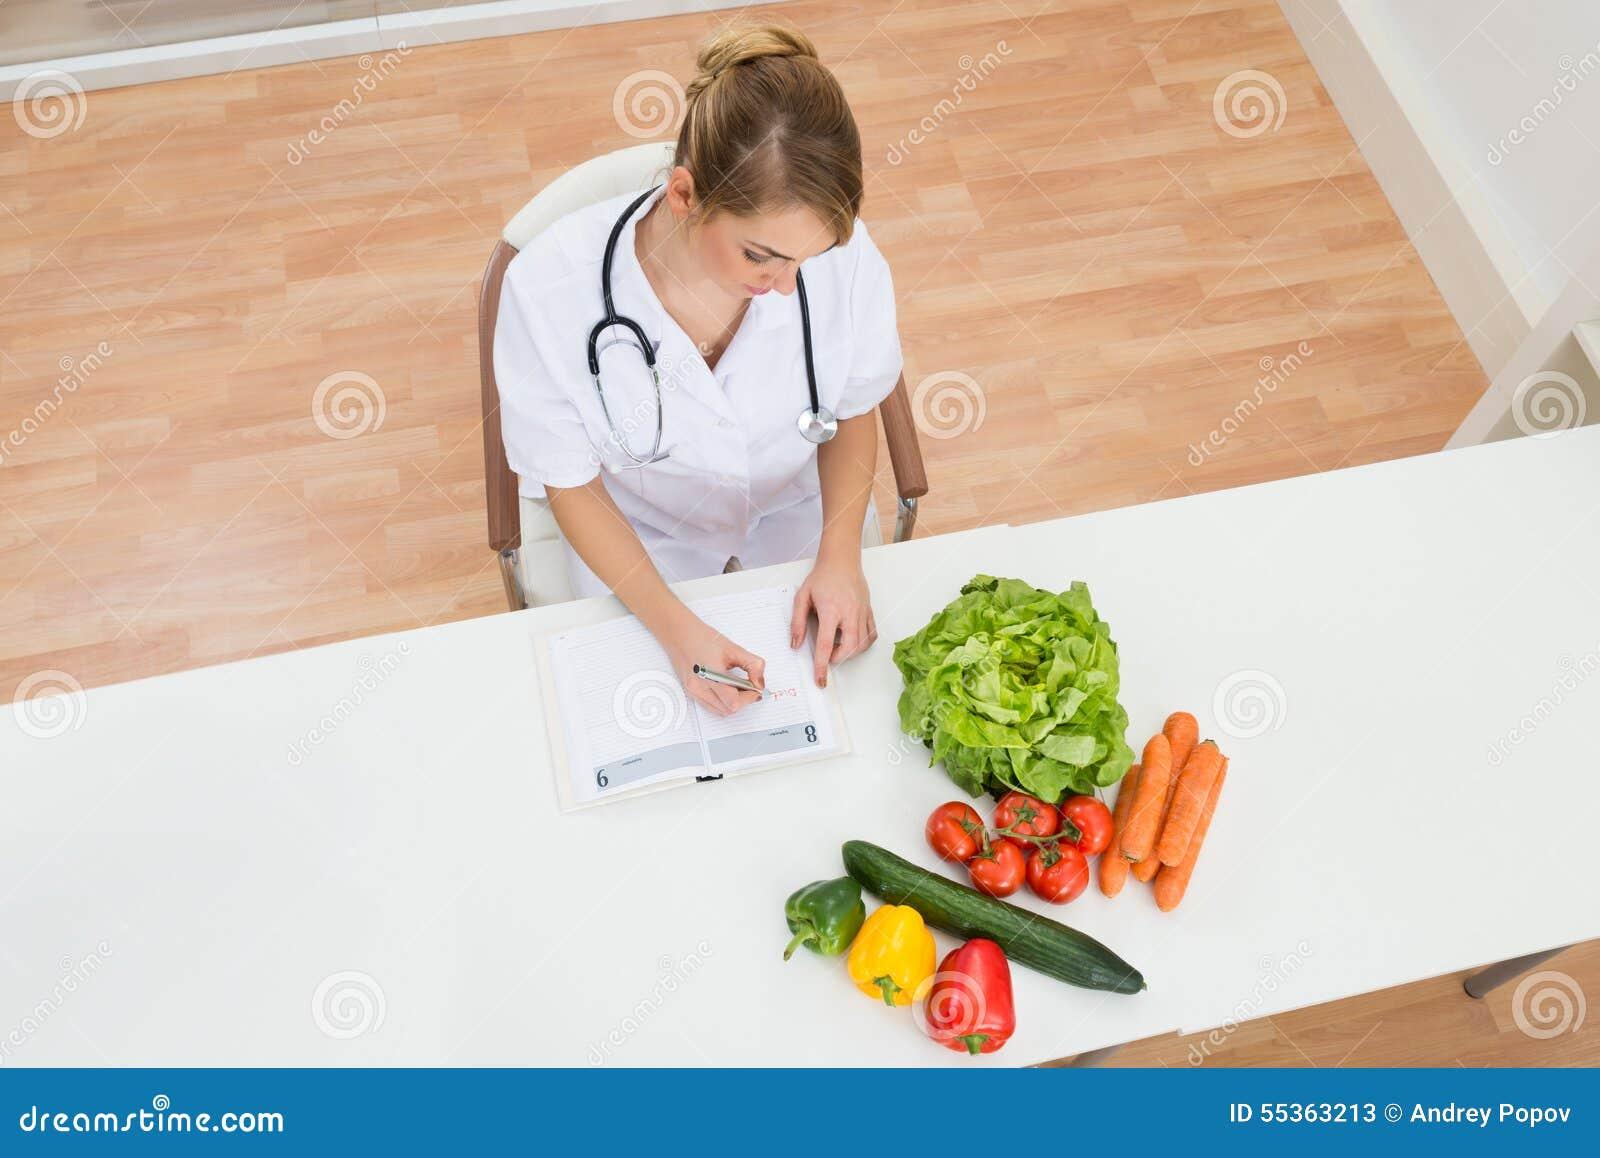 Scrittura femminile del dietista in diario